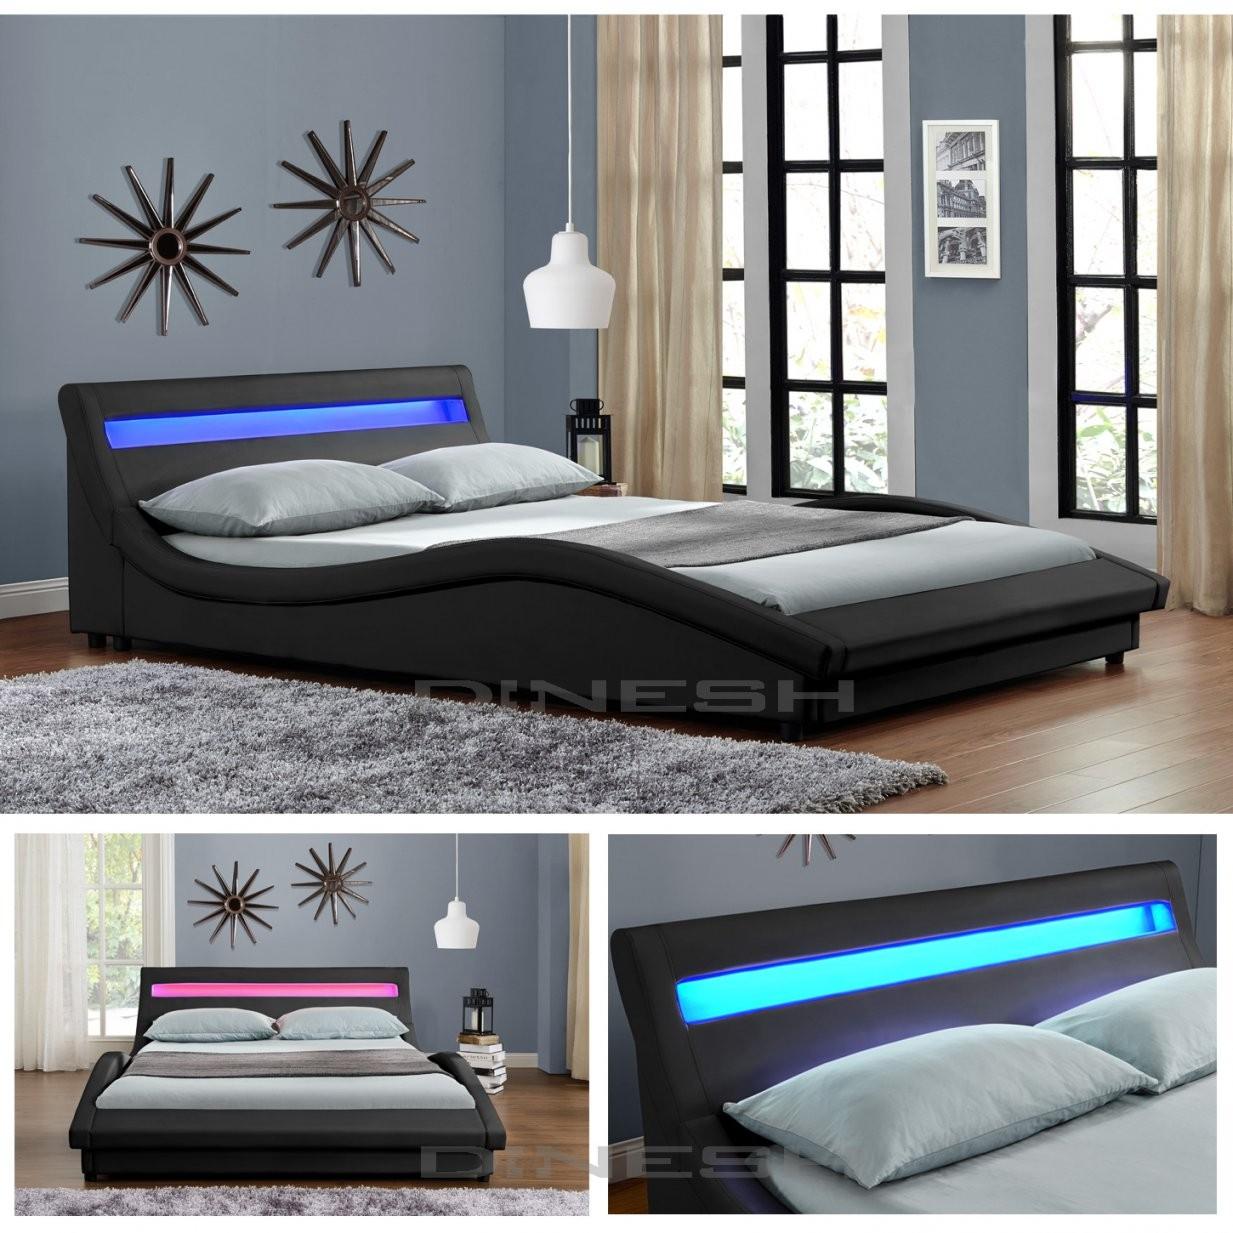 Charmant Bett 140X200 Komplett Günstig Billige Betten Billig von Polsterbett 140X200 Günstig Bild